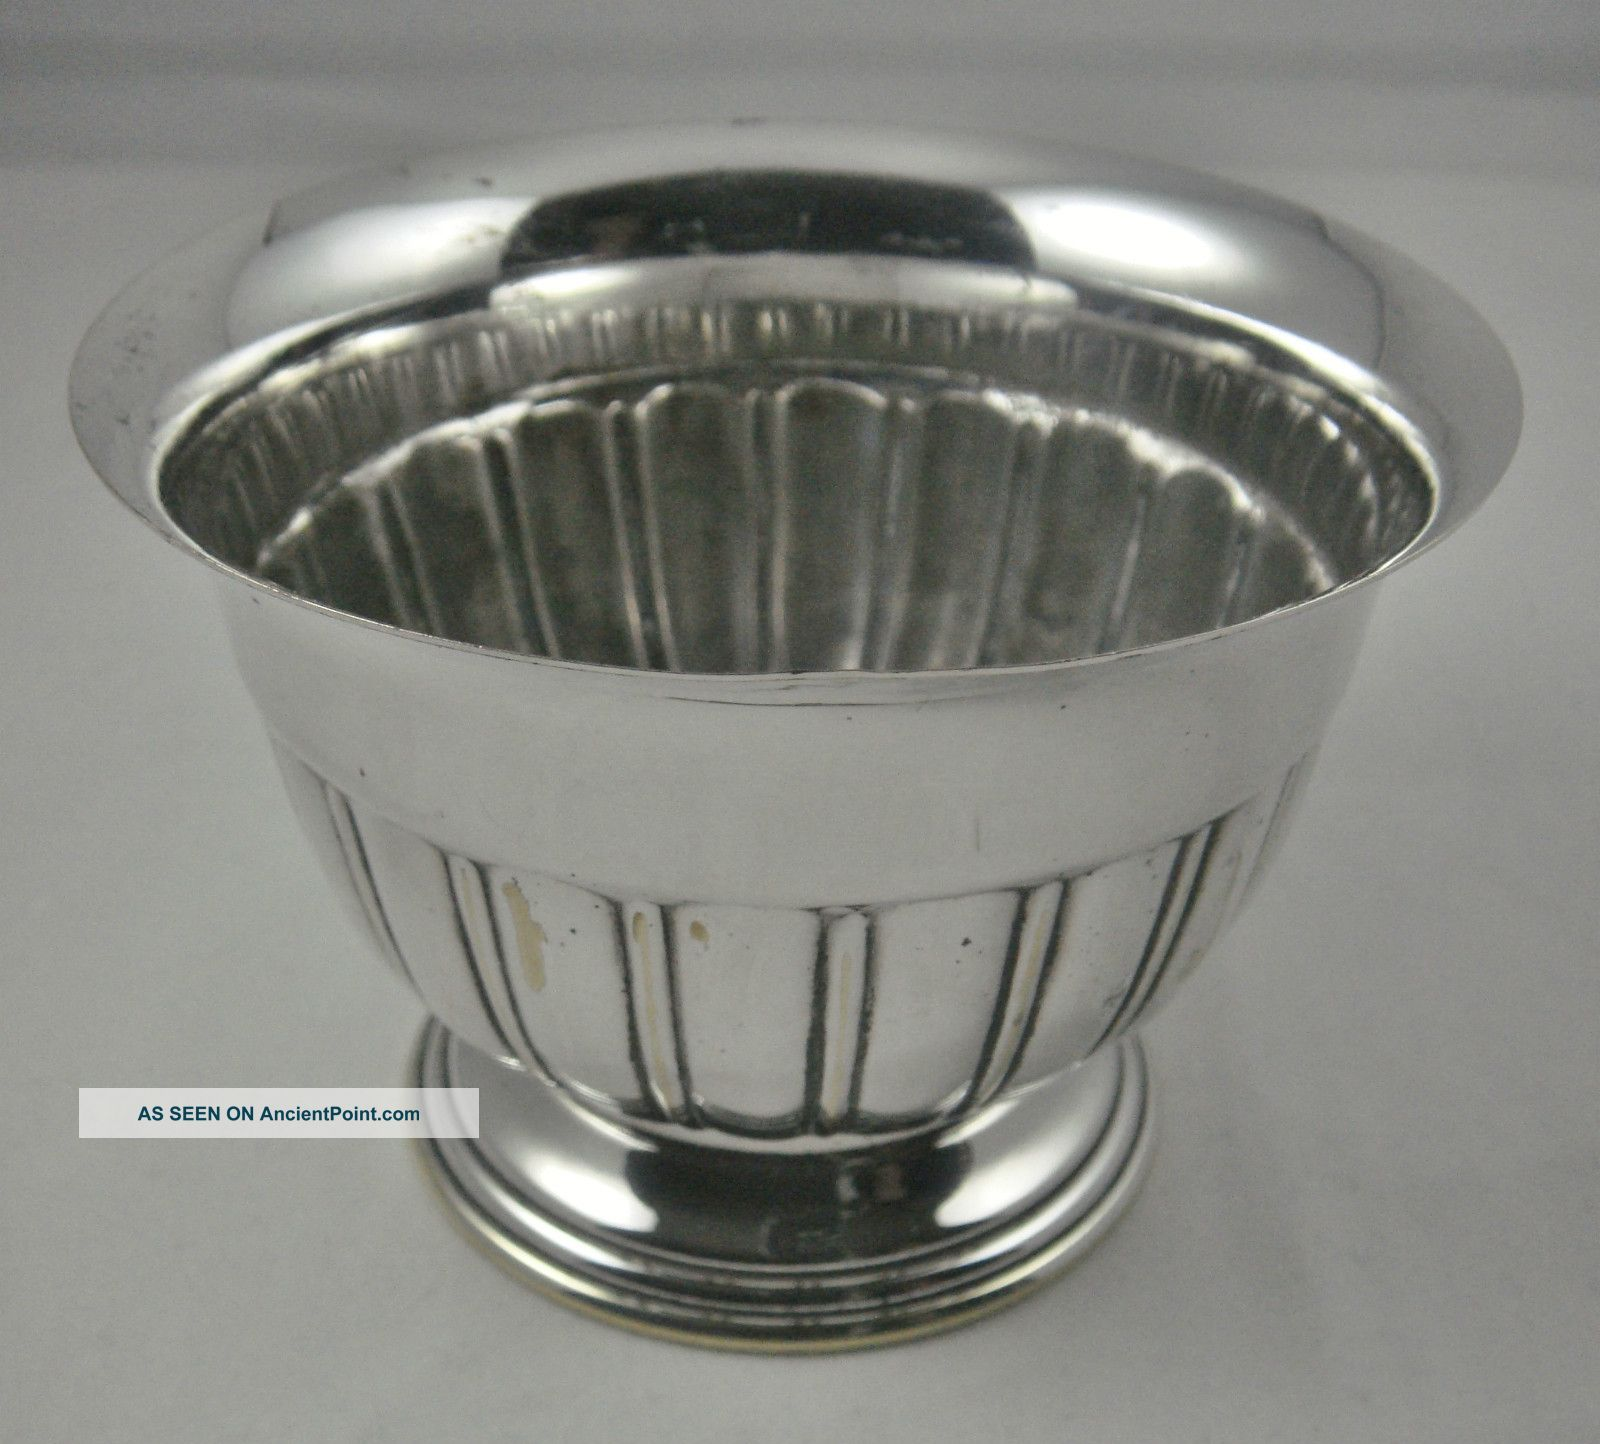 Vintage Ornate Semi Fluted English Silver Plated Flower Posy Bowl Vase Vases & Urns photo